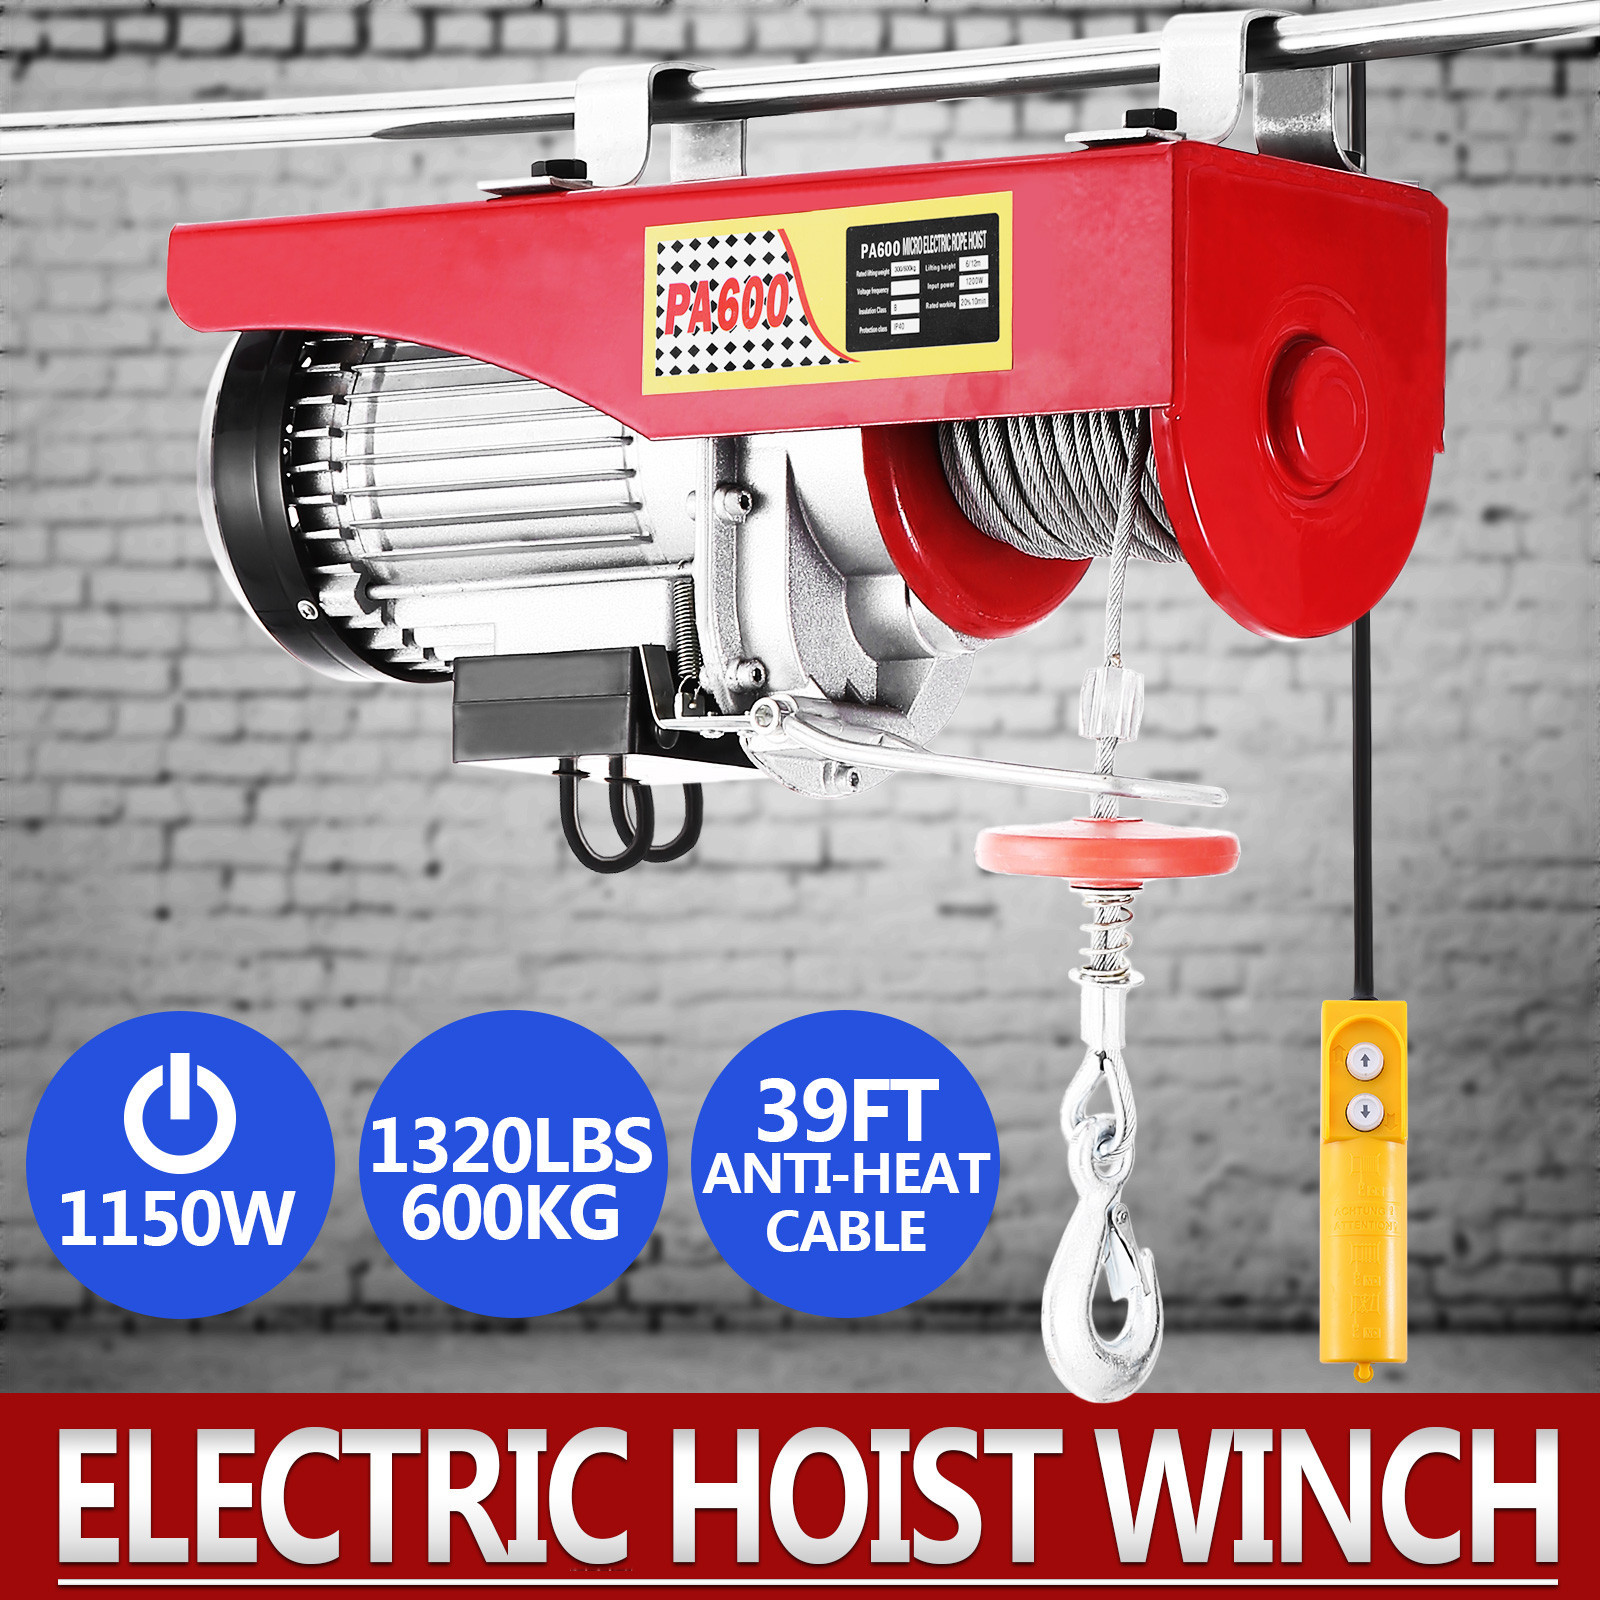 100kg-900kg-Electric-Hoist-Winch-Lifting-Engine-Crane-Cable-Lift-Hook-Garage miniature 37